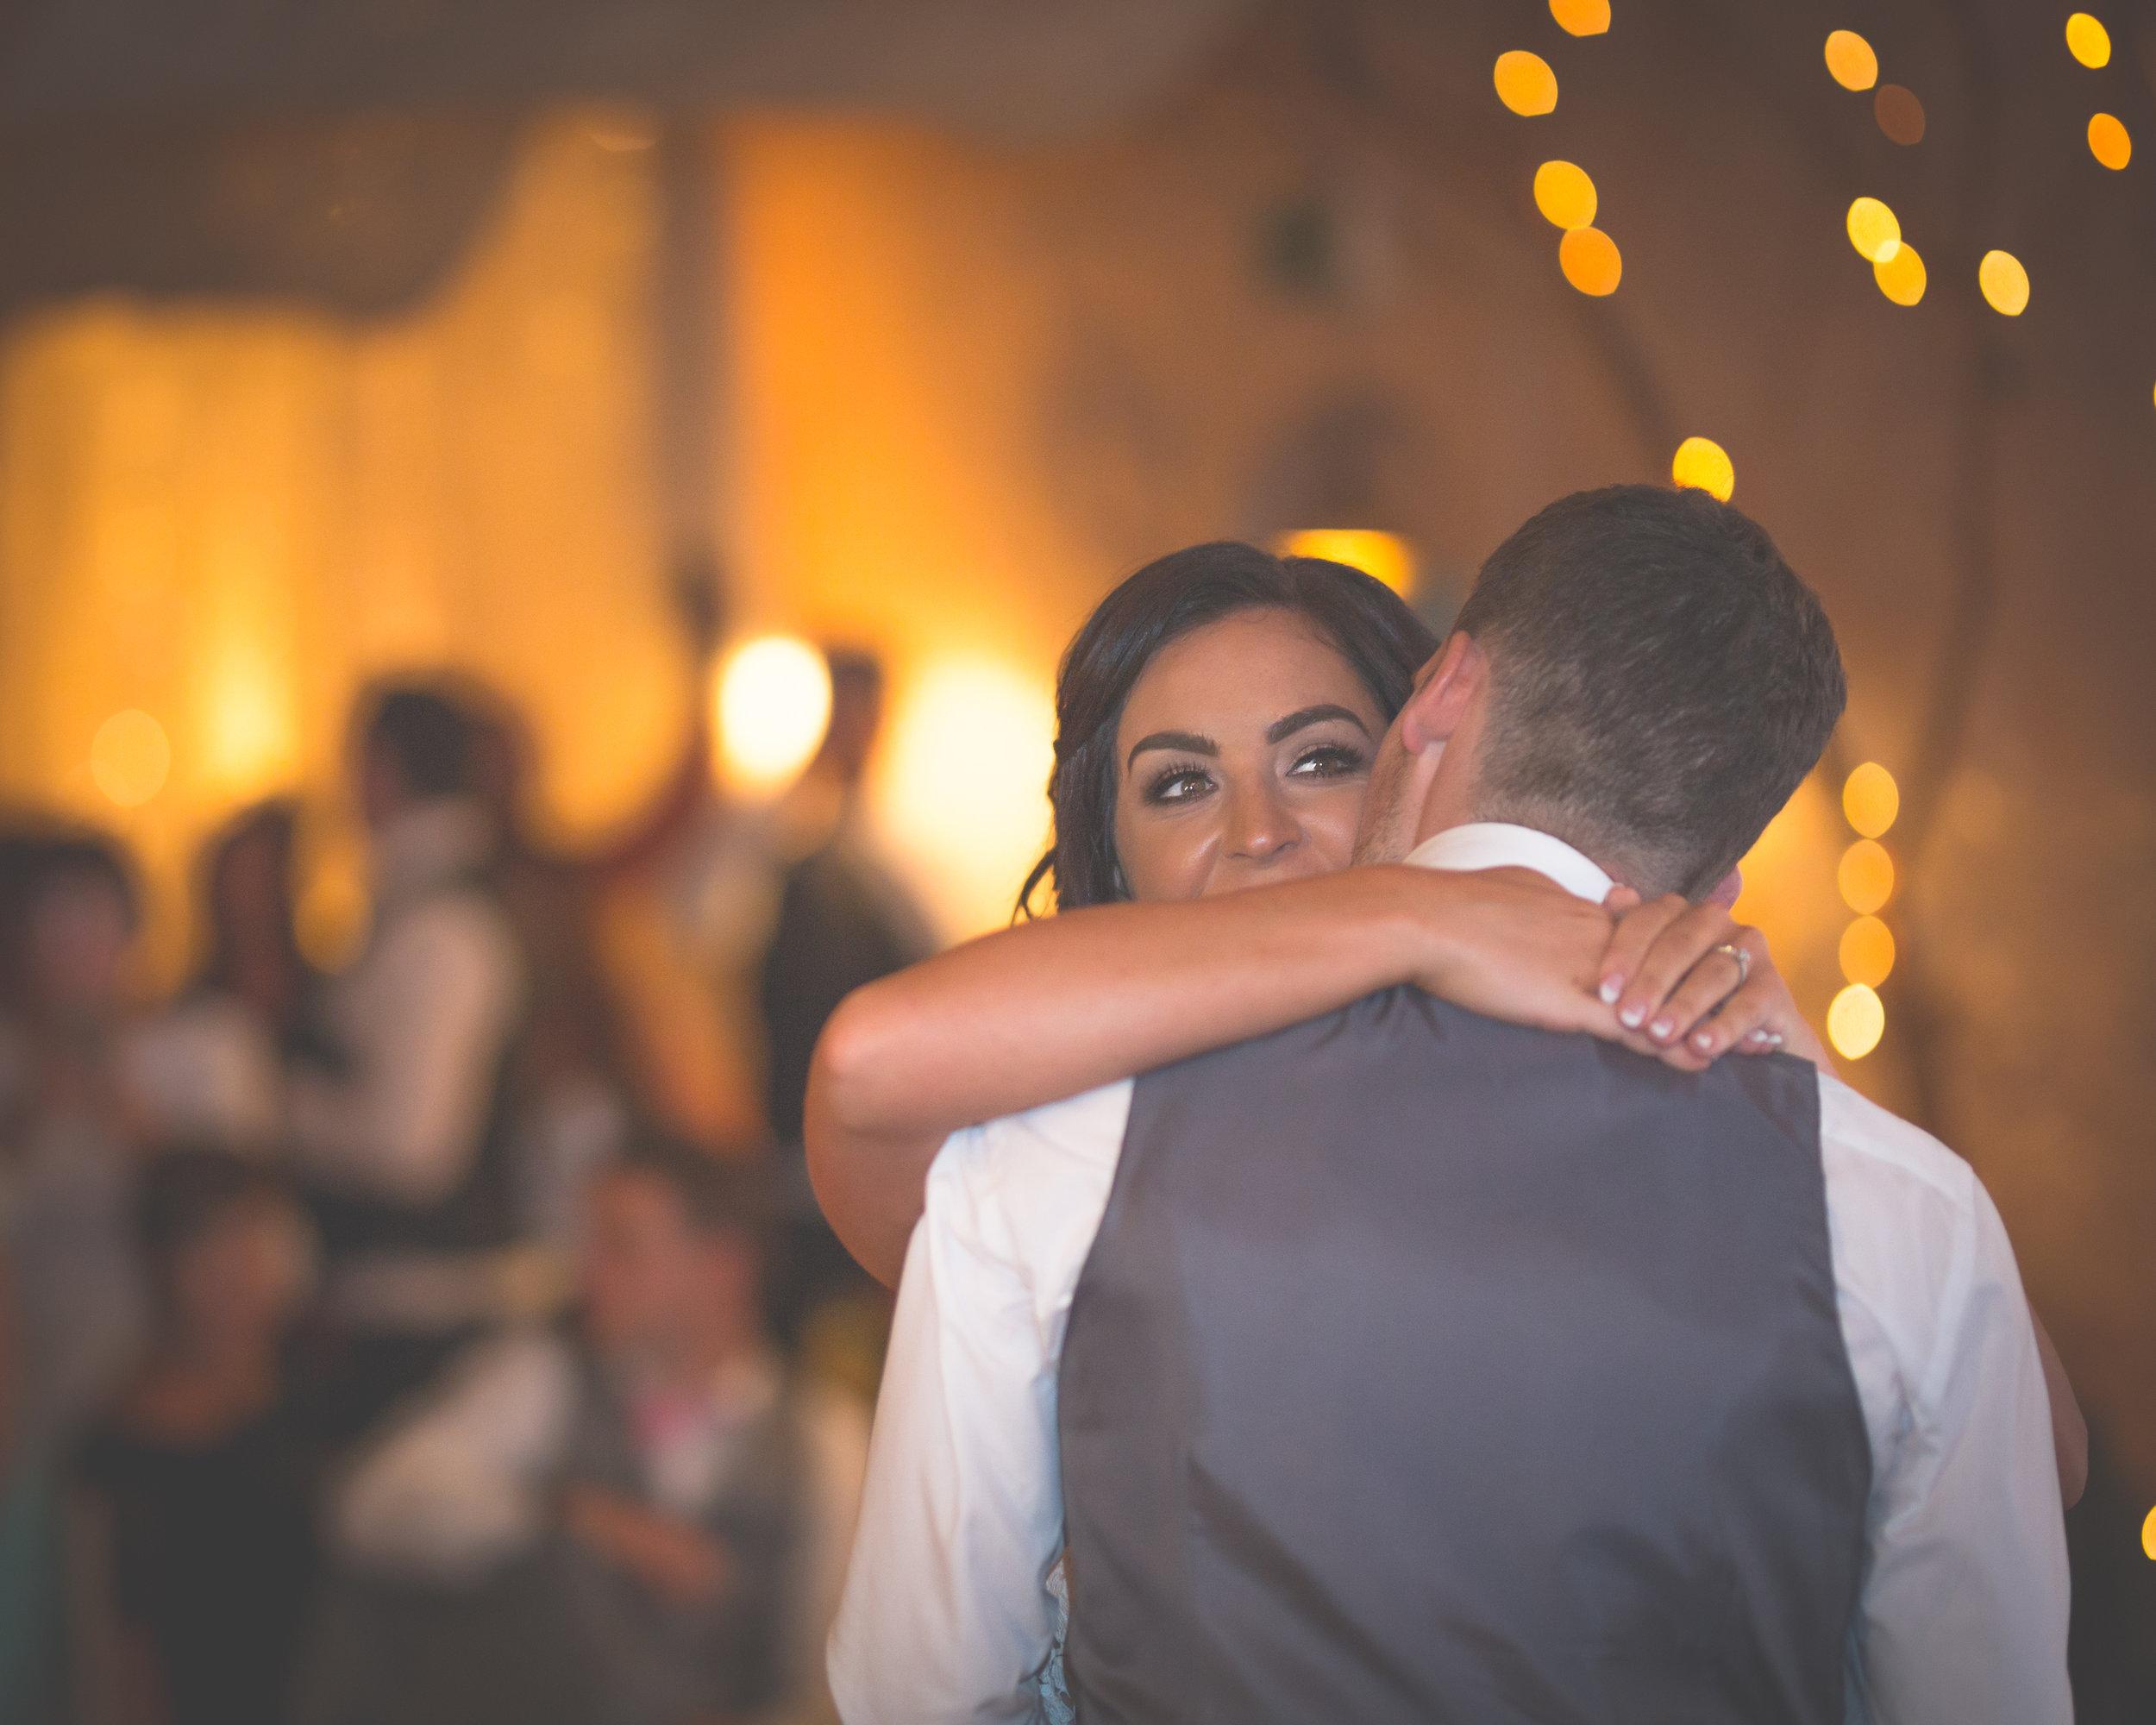 Brian McEwan Wedding Photography | Carol-Annee & Sean | The Dancing-26.jpg